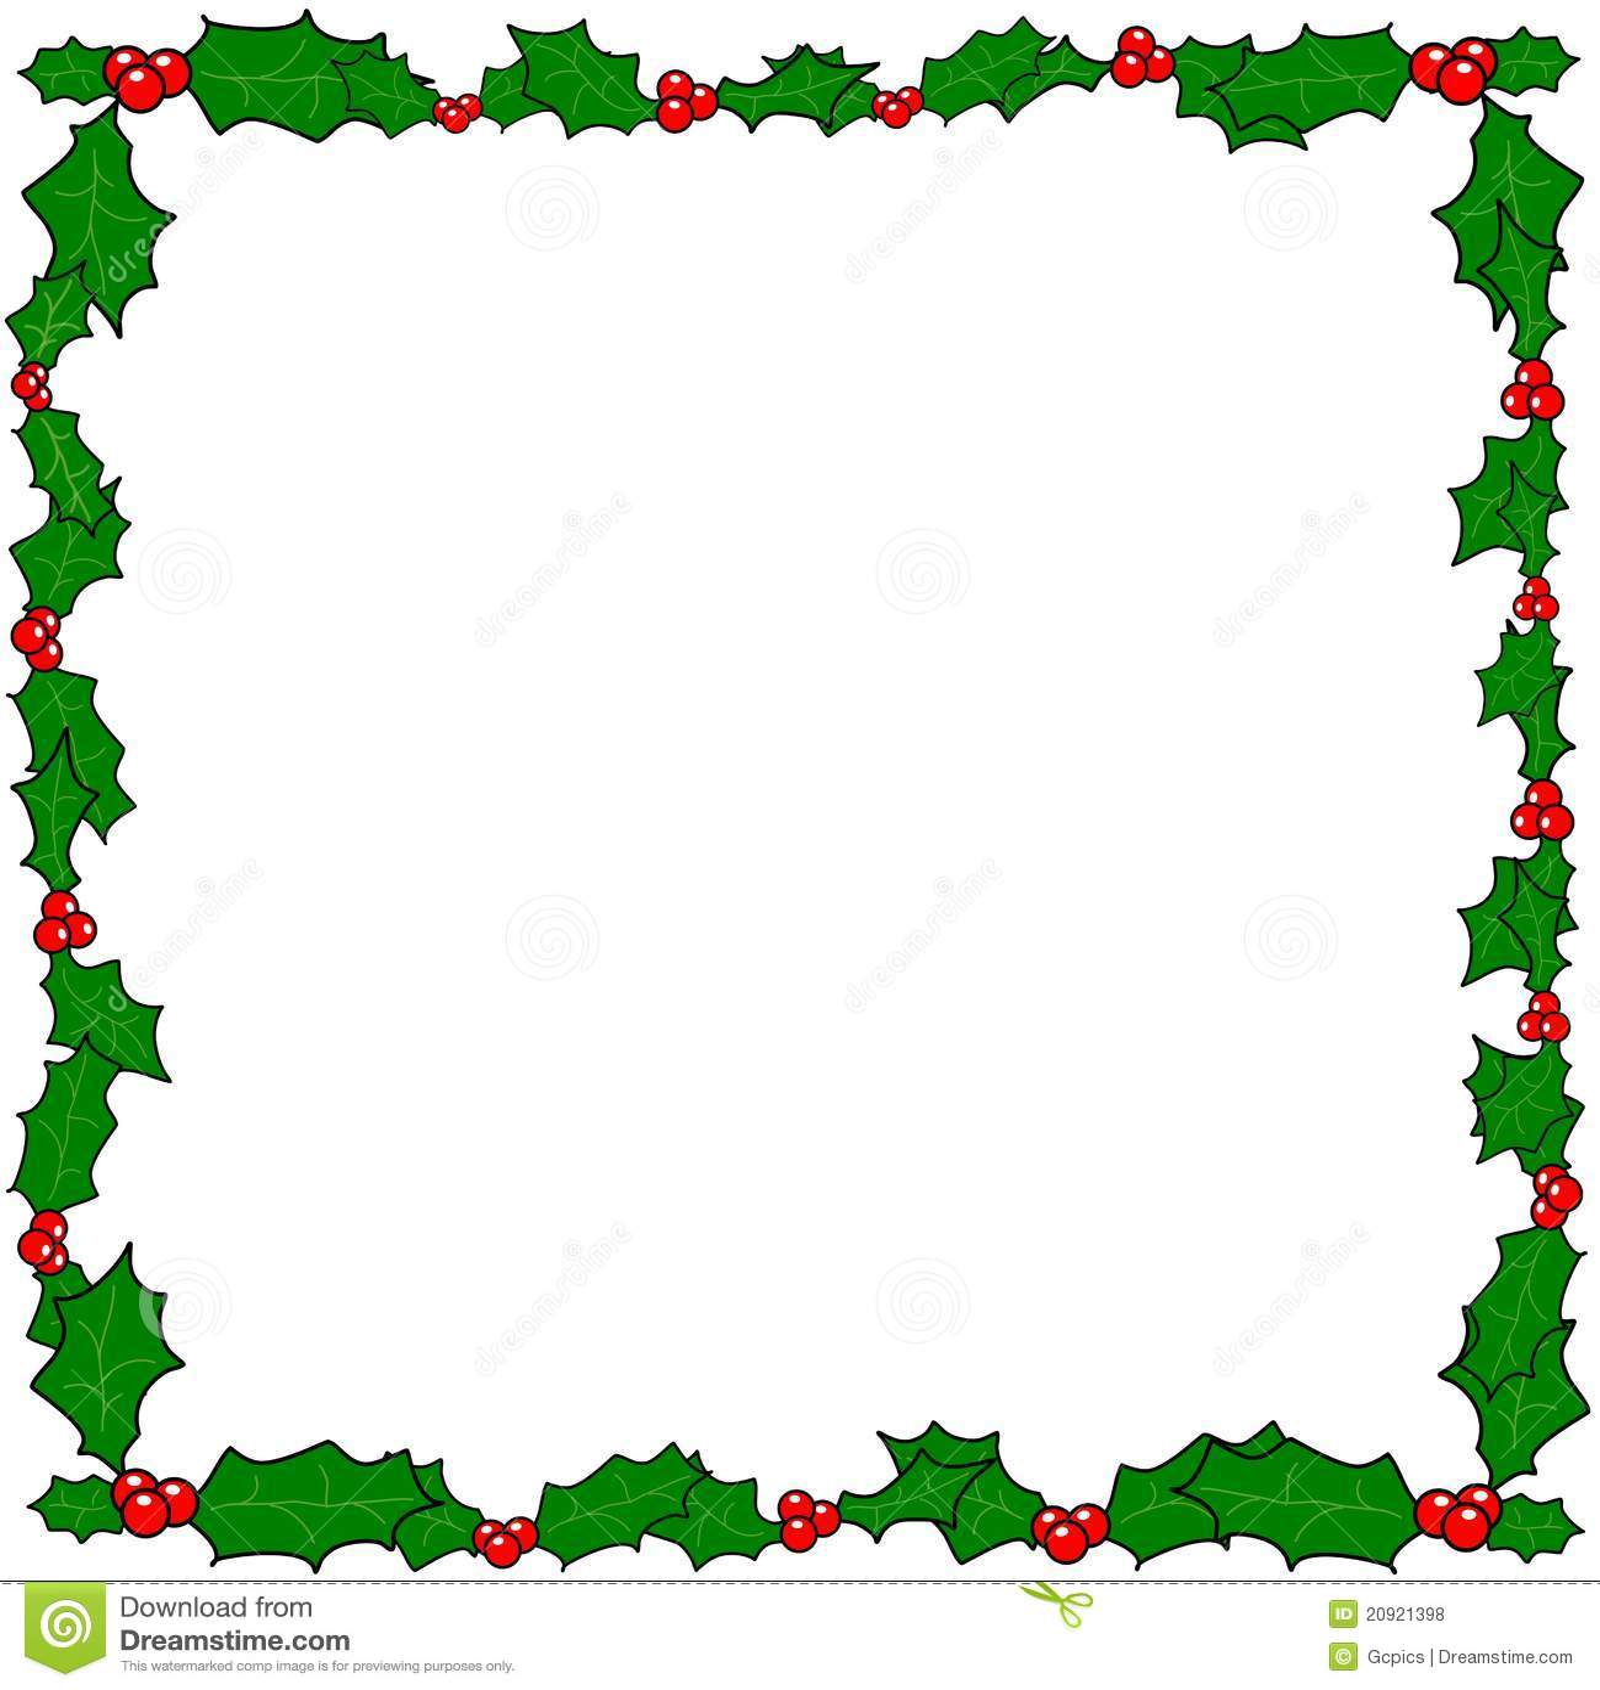 Christmas Holly Border Frame Royalty Free Stock Photos - Image ...